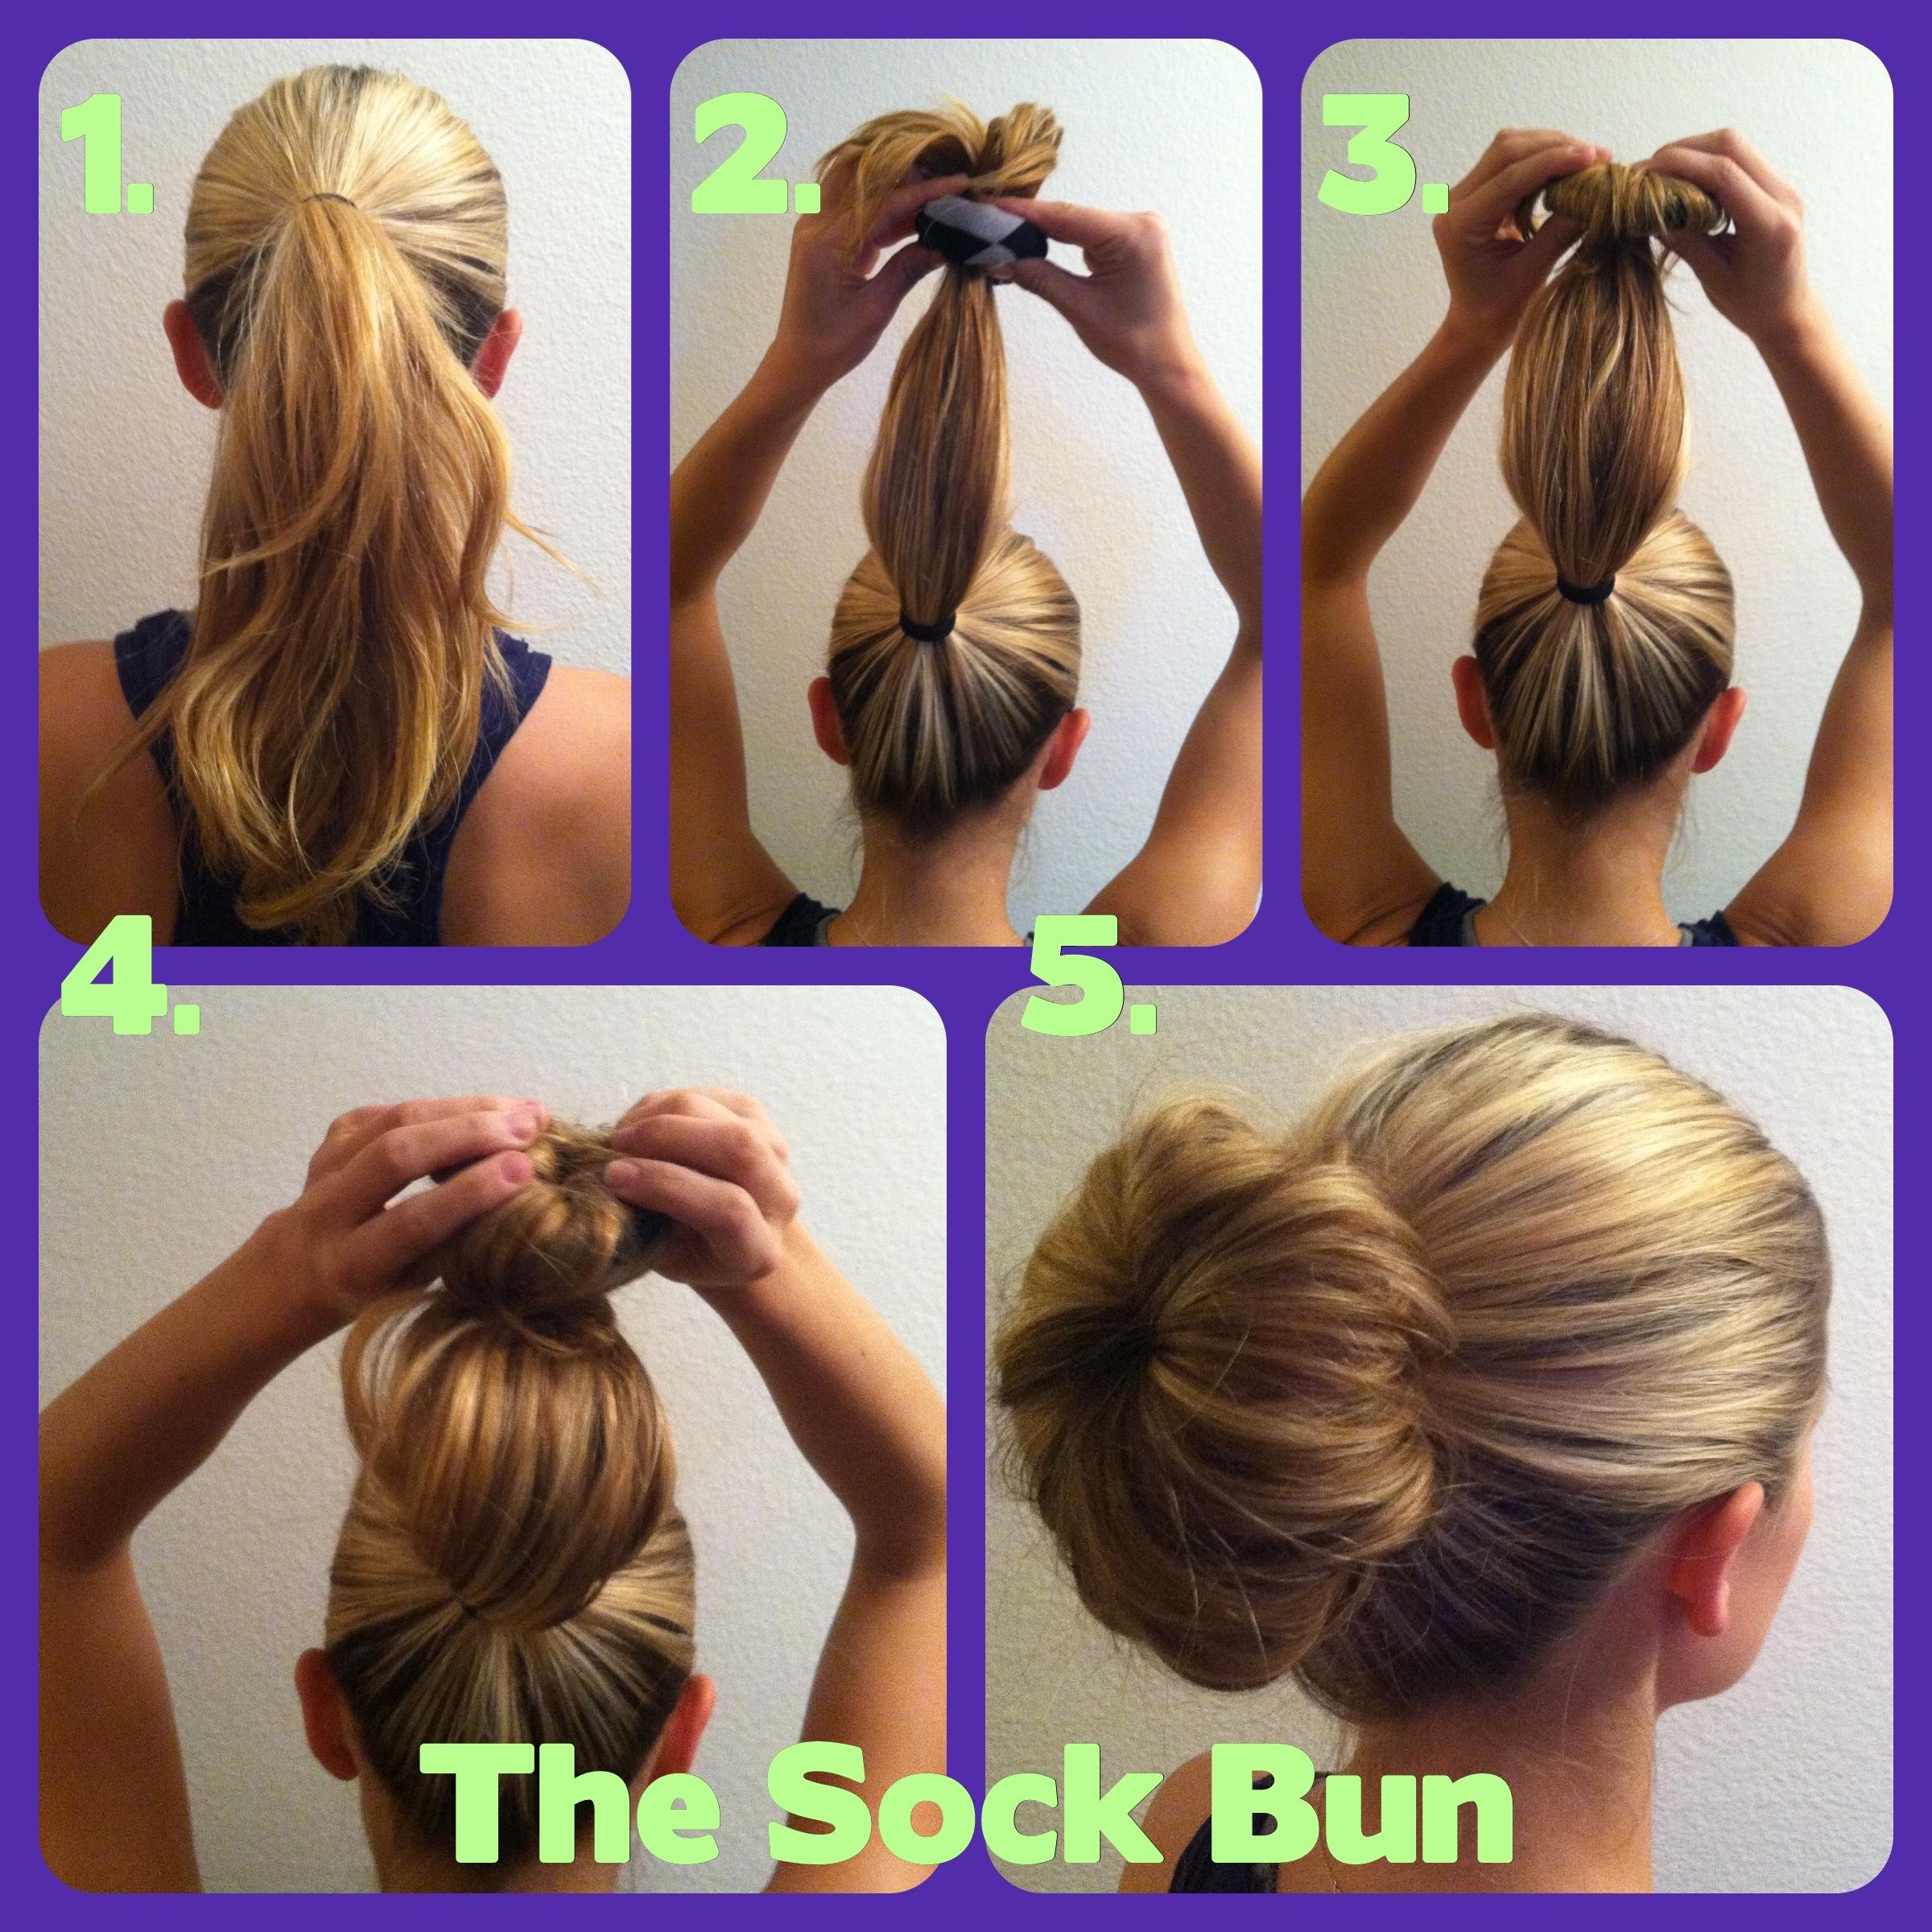 How To Get That Classy Fabulous Sock Bun Hairdo Rachaellee